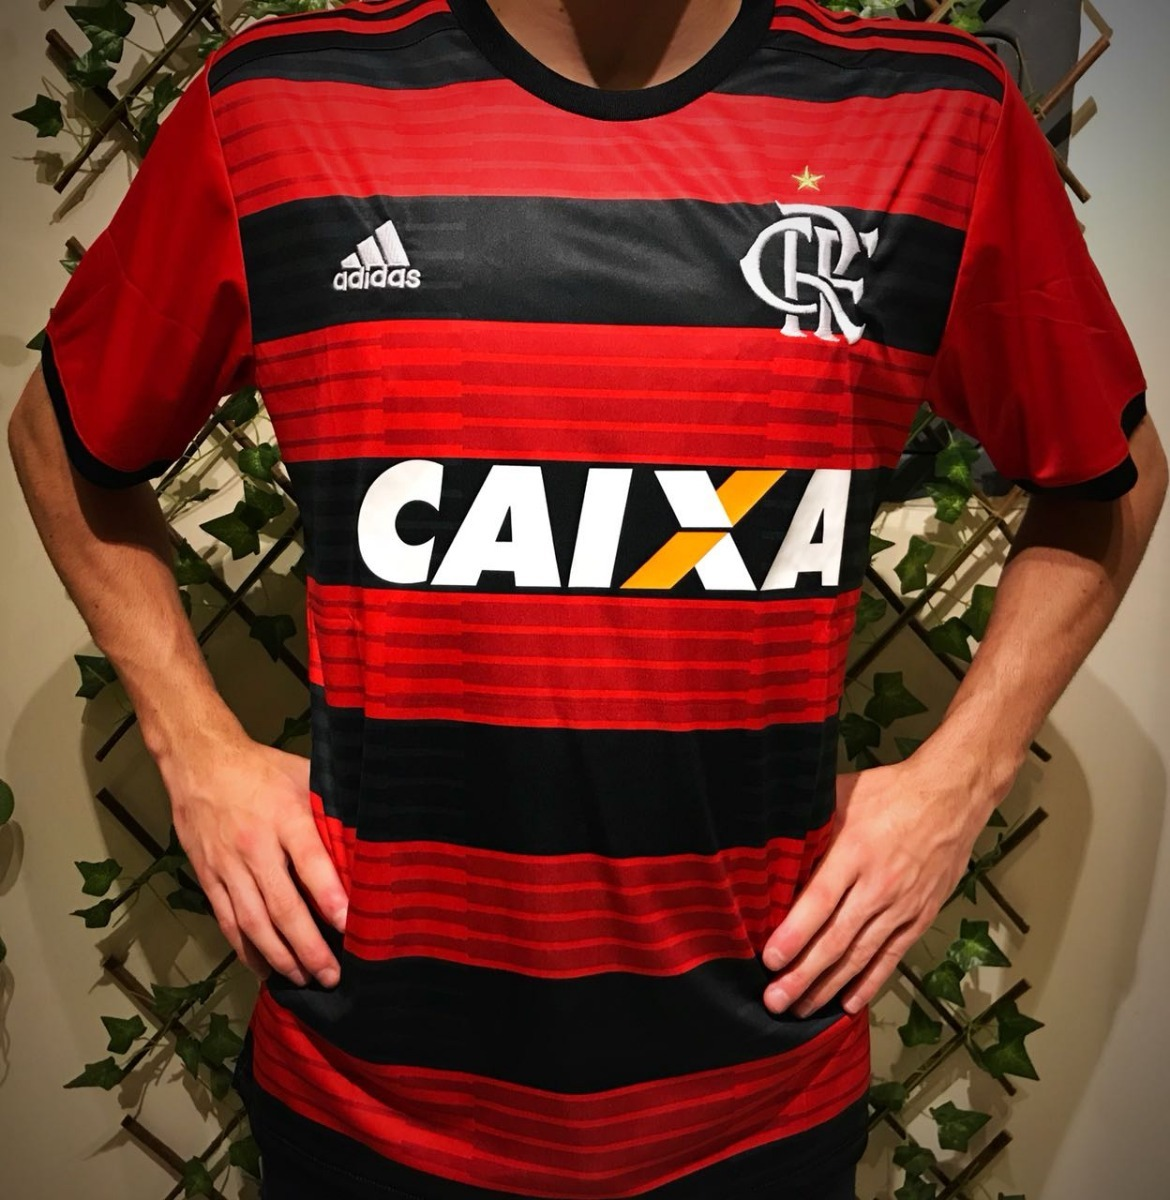 f85bdc3396 ... camiseta flamengo s patrocínio torcedor vermelha s n° home. Carregando  zoom. beb170beb67ddb ...